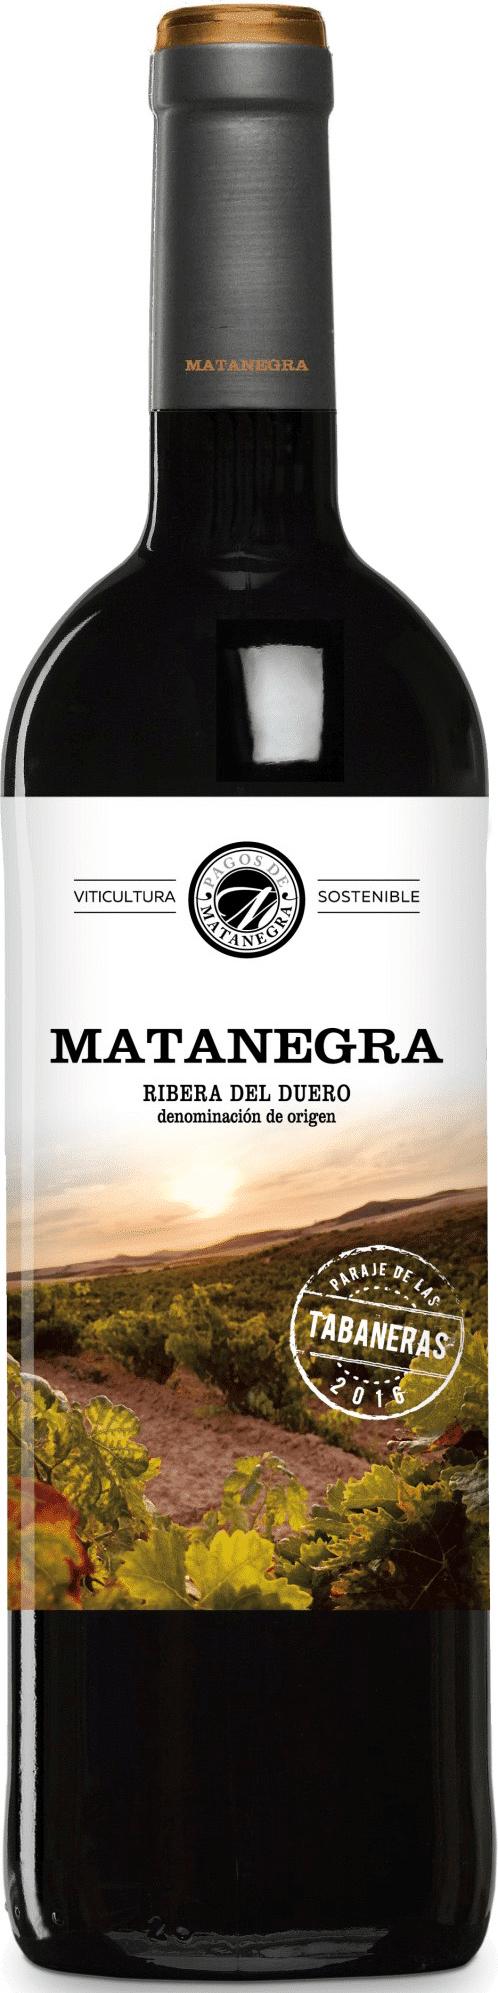 Pagos de Matanegra Tabaneras Ribera del Duero | Spanje | gemaakt van de druif: Tempranillo